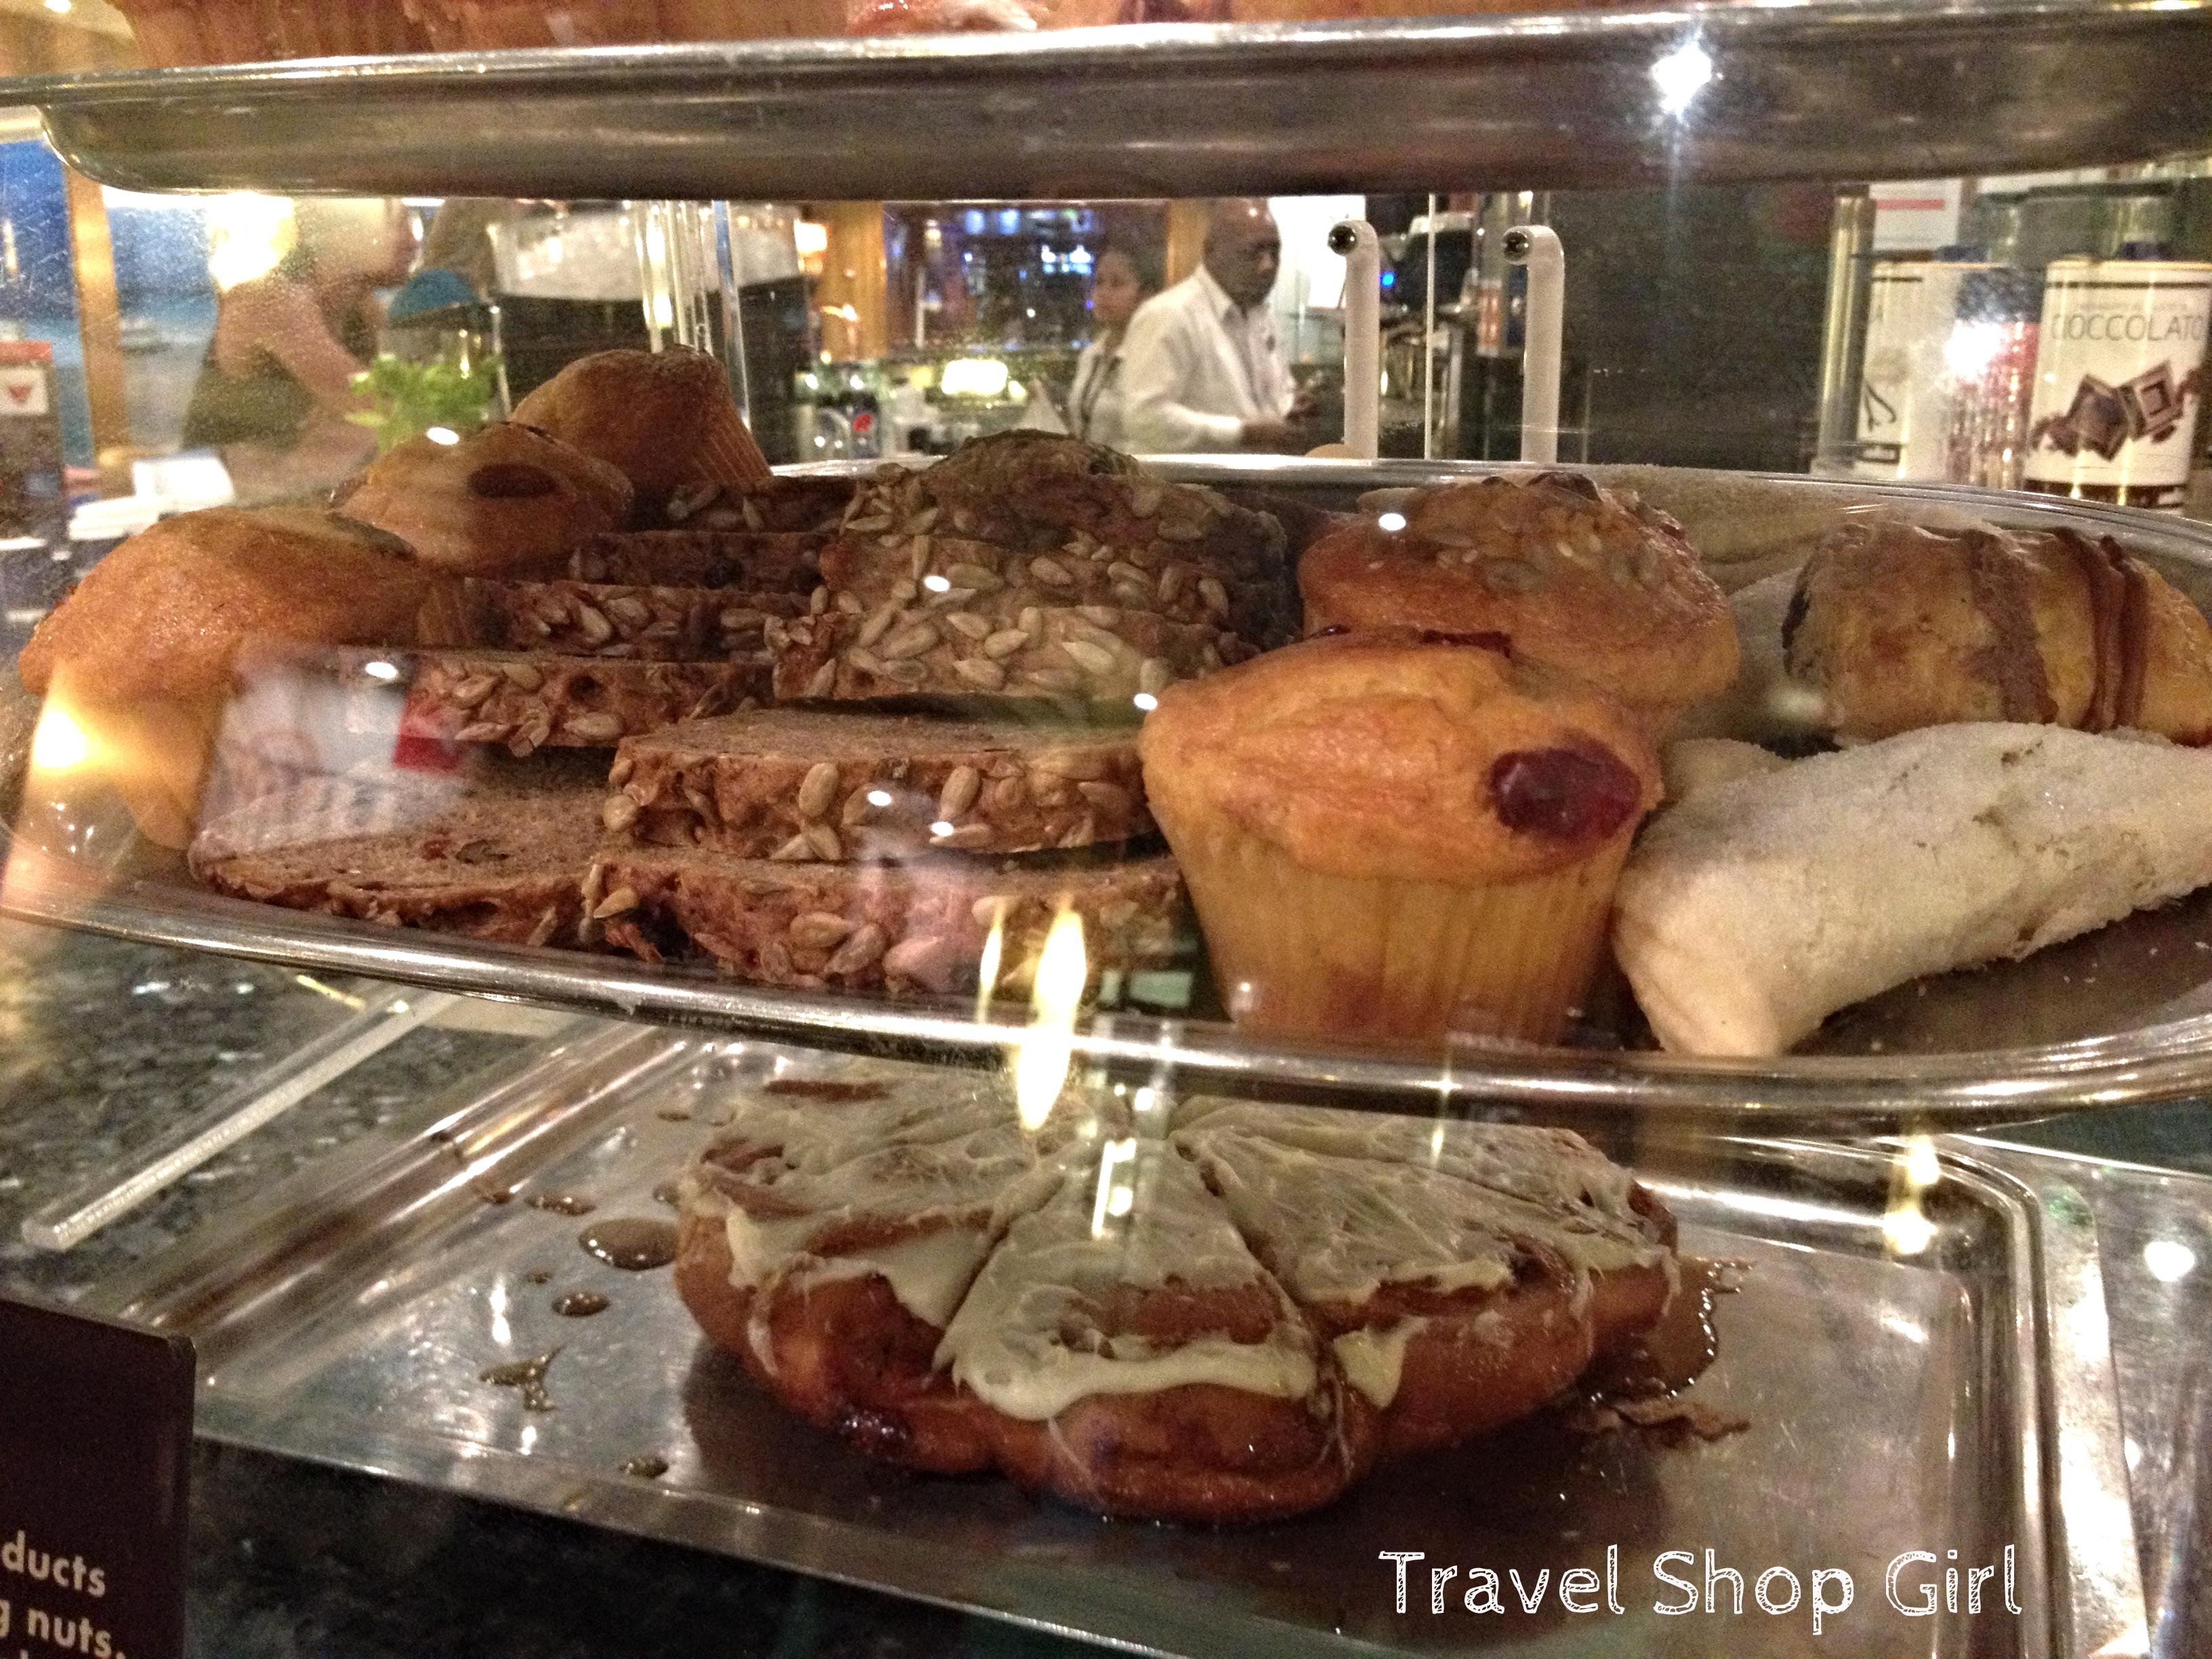 Norwegian Sky Norwegian Cruise Line Food And Beverage Options Travel Shop Girl